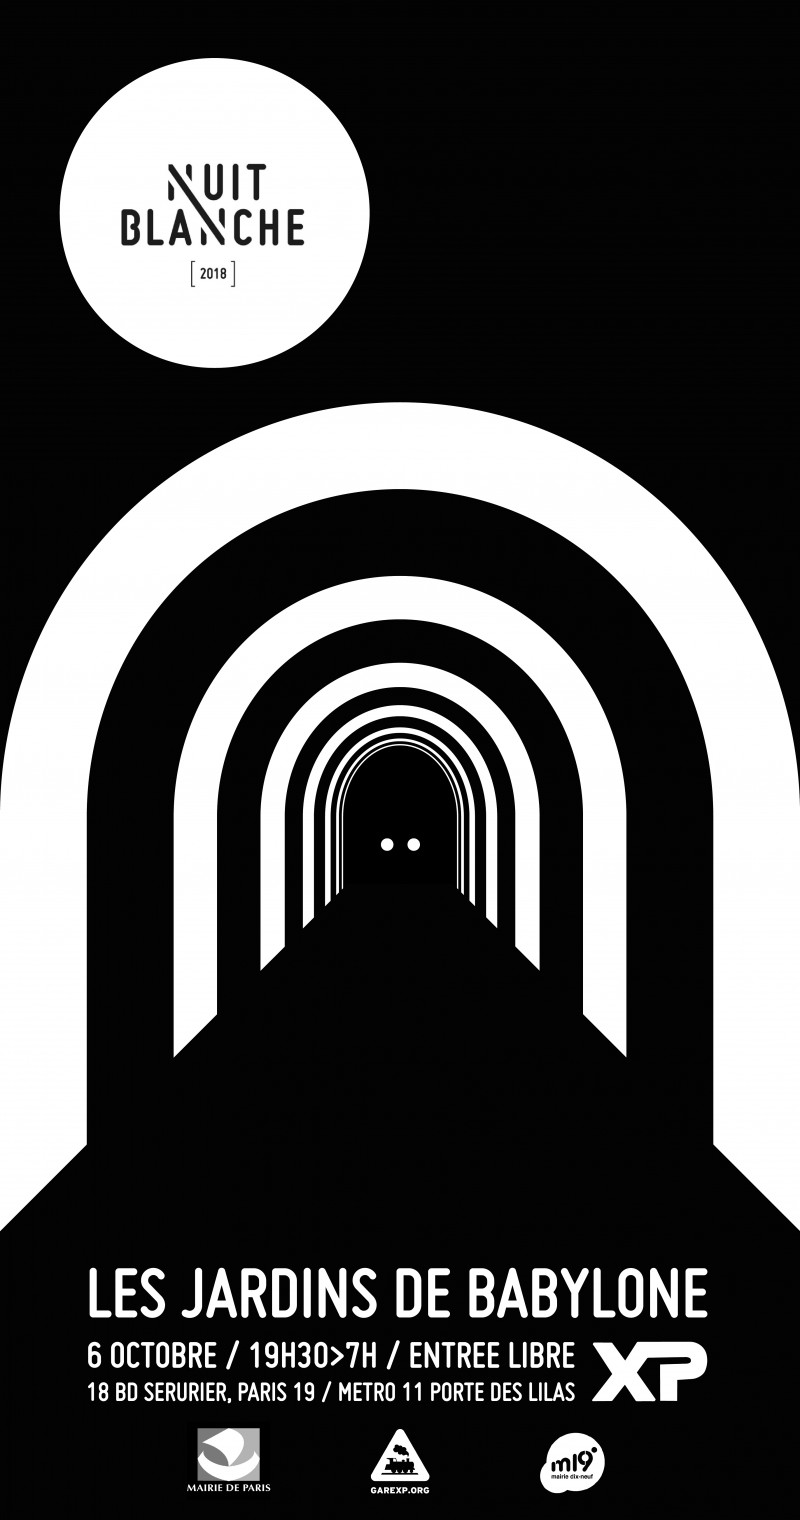 affiche-nuit-blanche-2018-gare-xp-0c4b34b909009dd0255e3526a01b8628